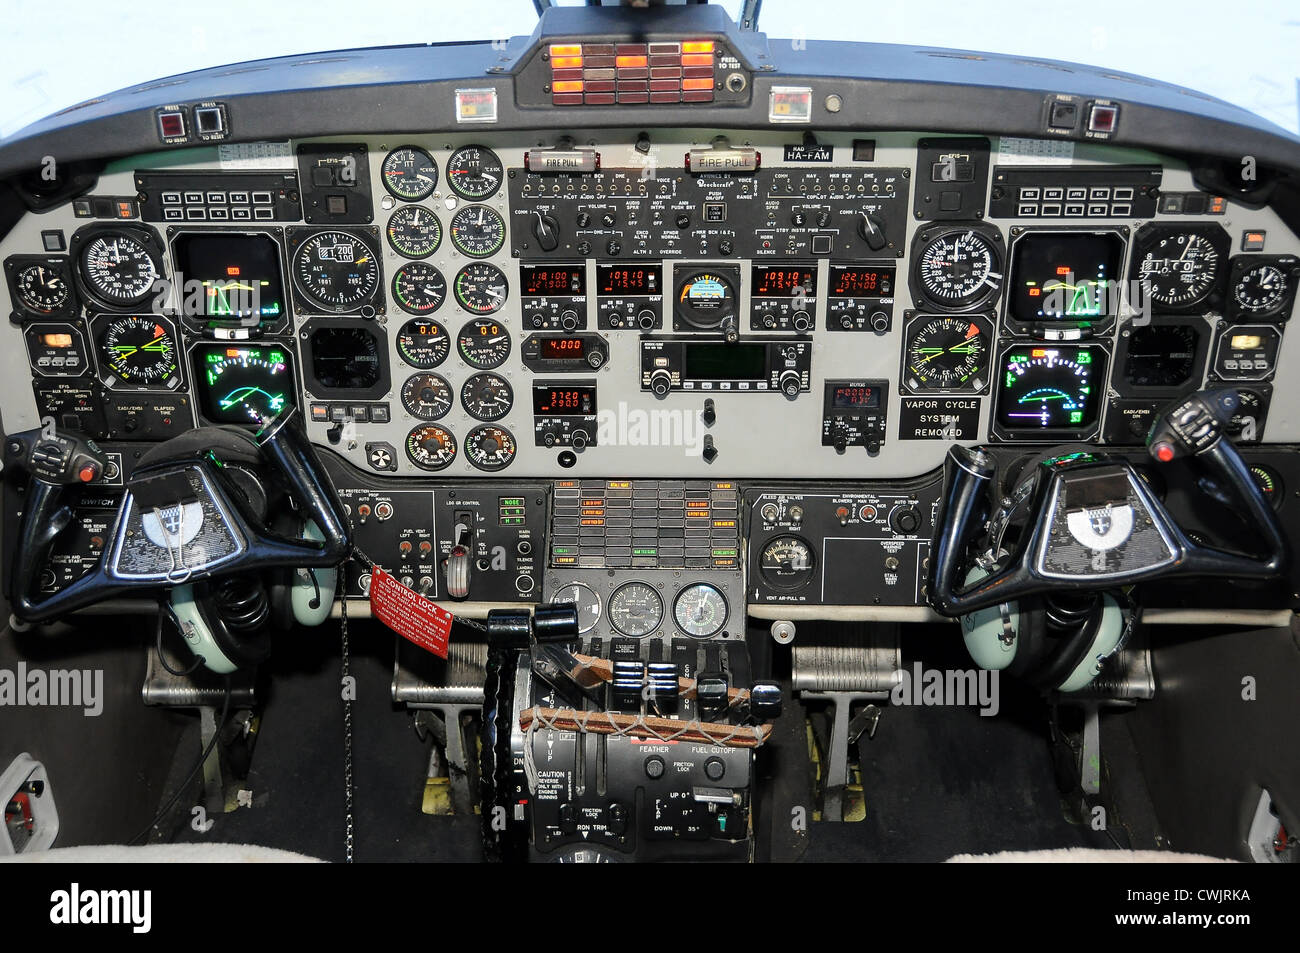 Aircraft Cockpit - Stock Image